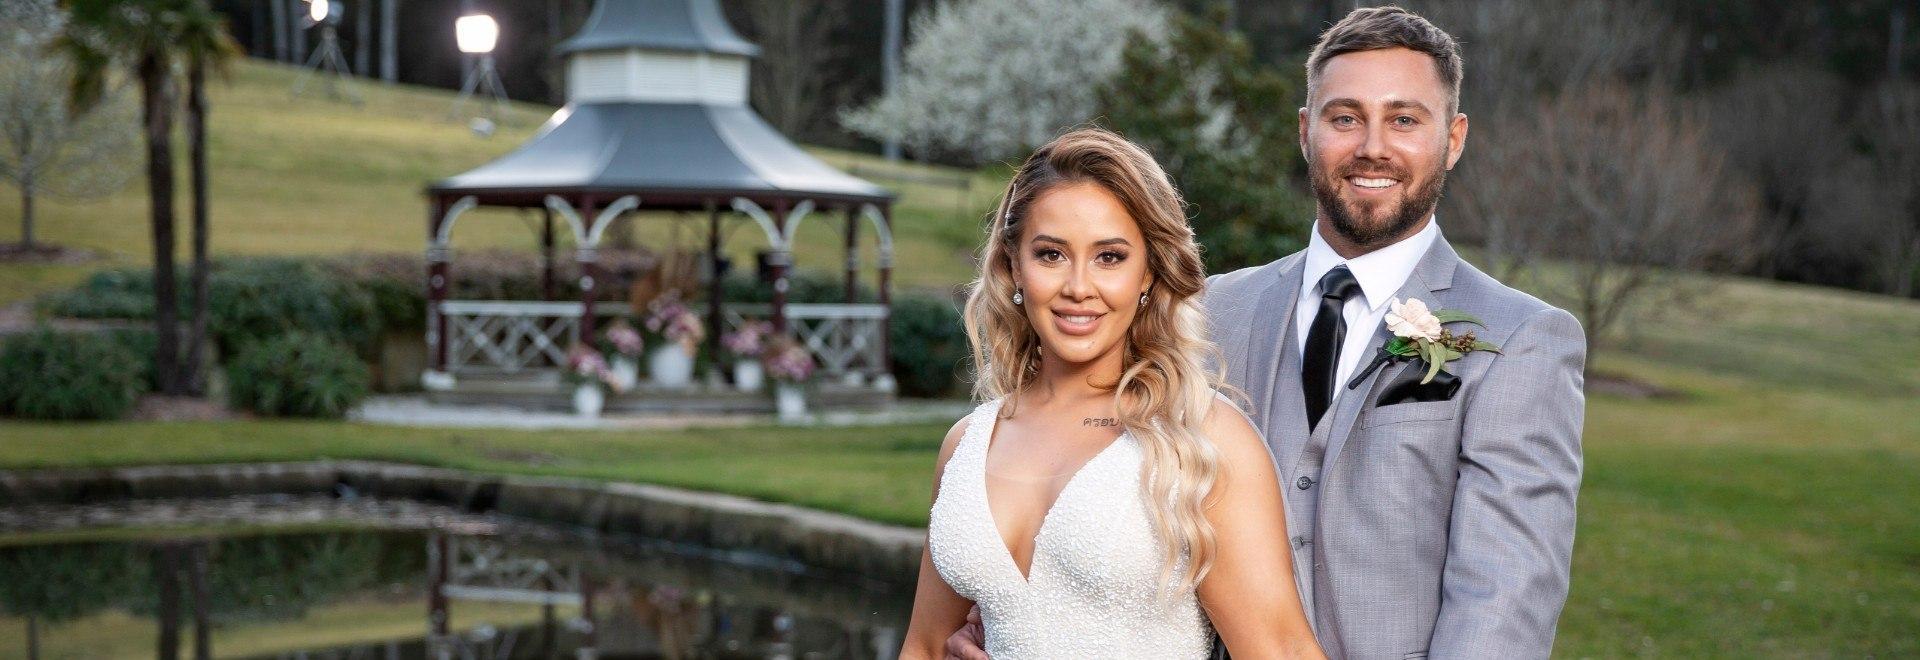 Matrimonio a prima vista Australia